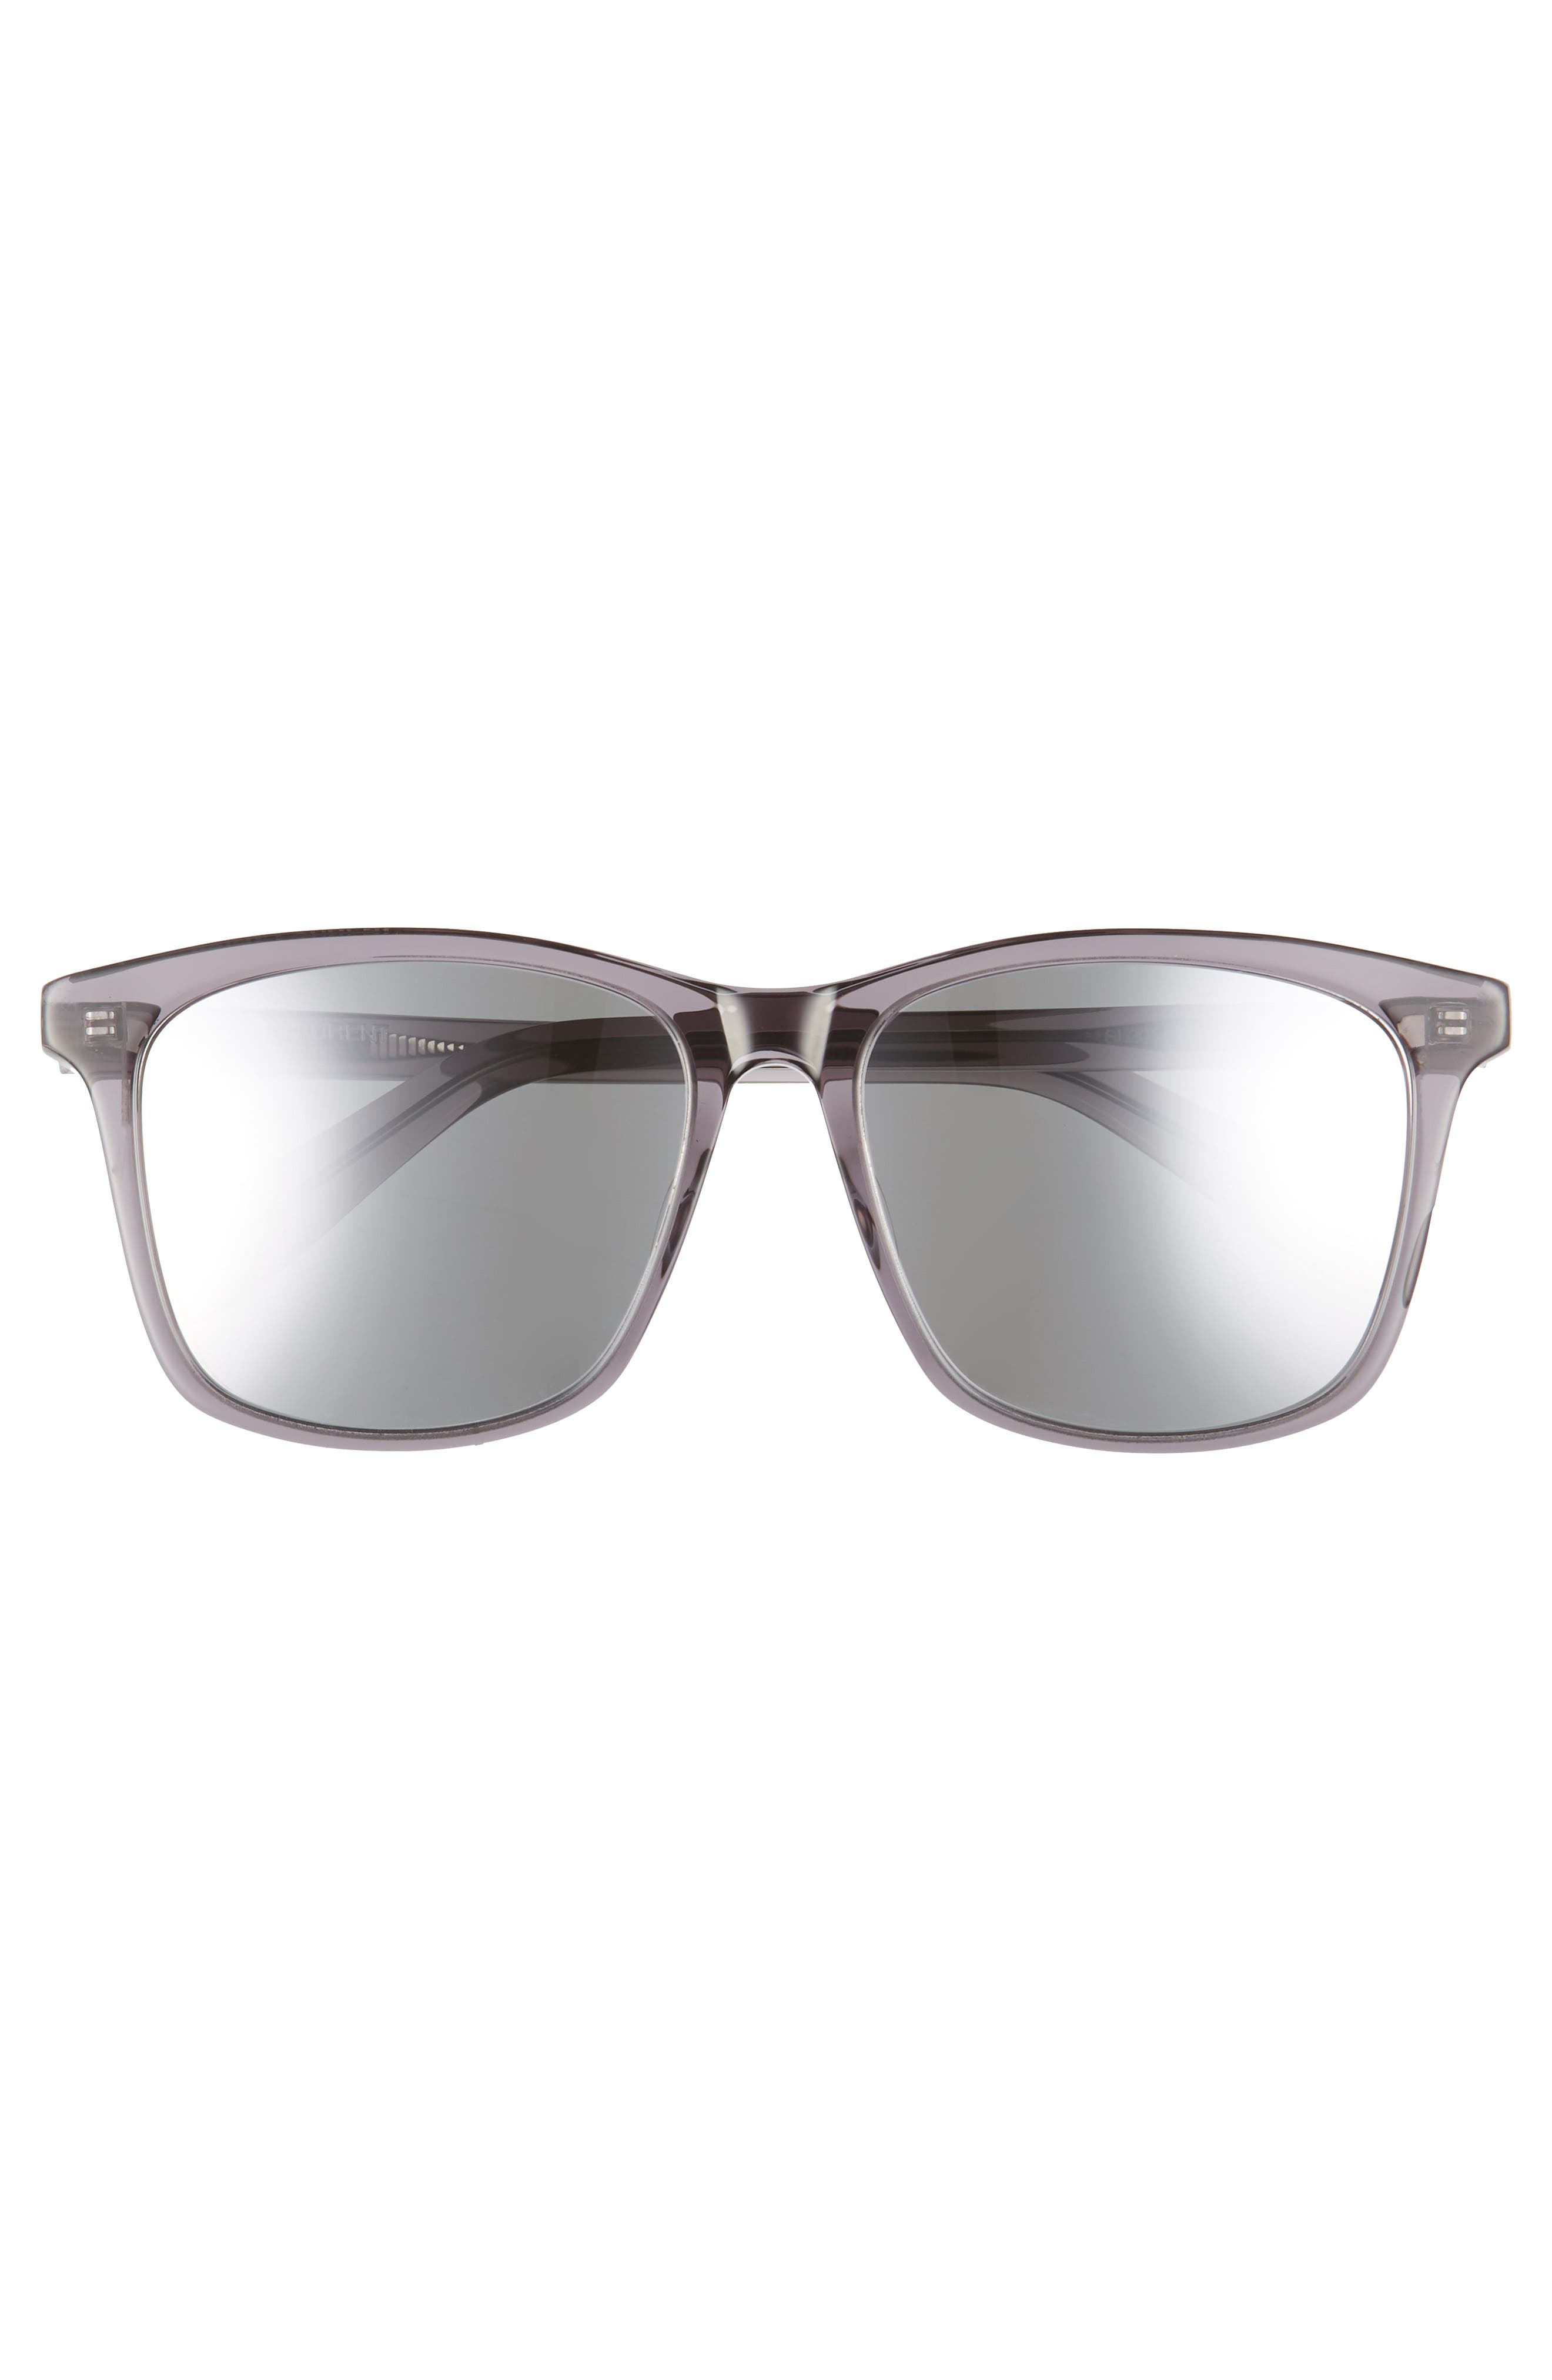 205/K 57mm Sunglasses,                             Alternate thumbnail 2, color,                             GREY